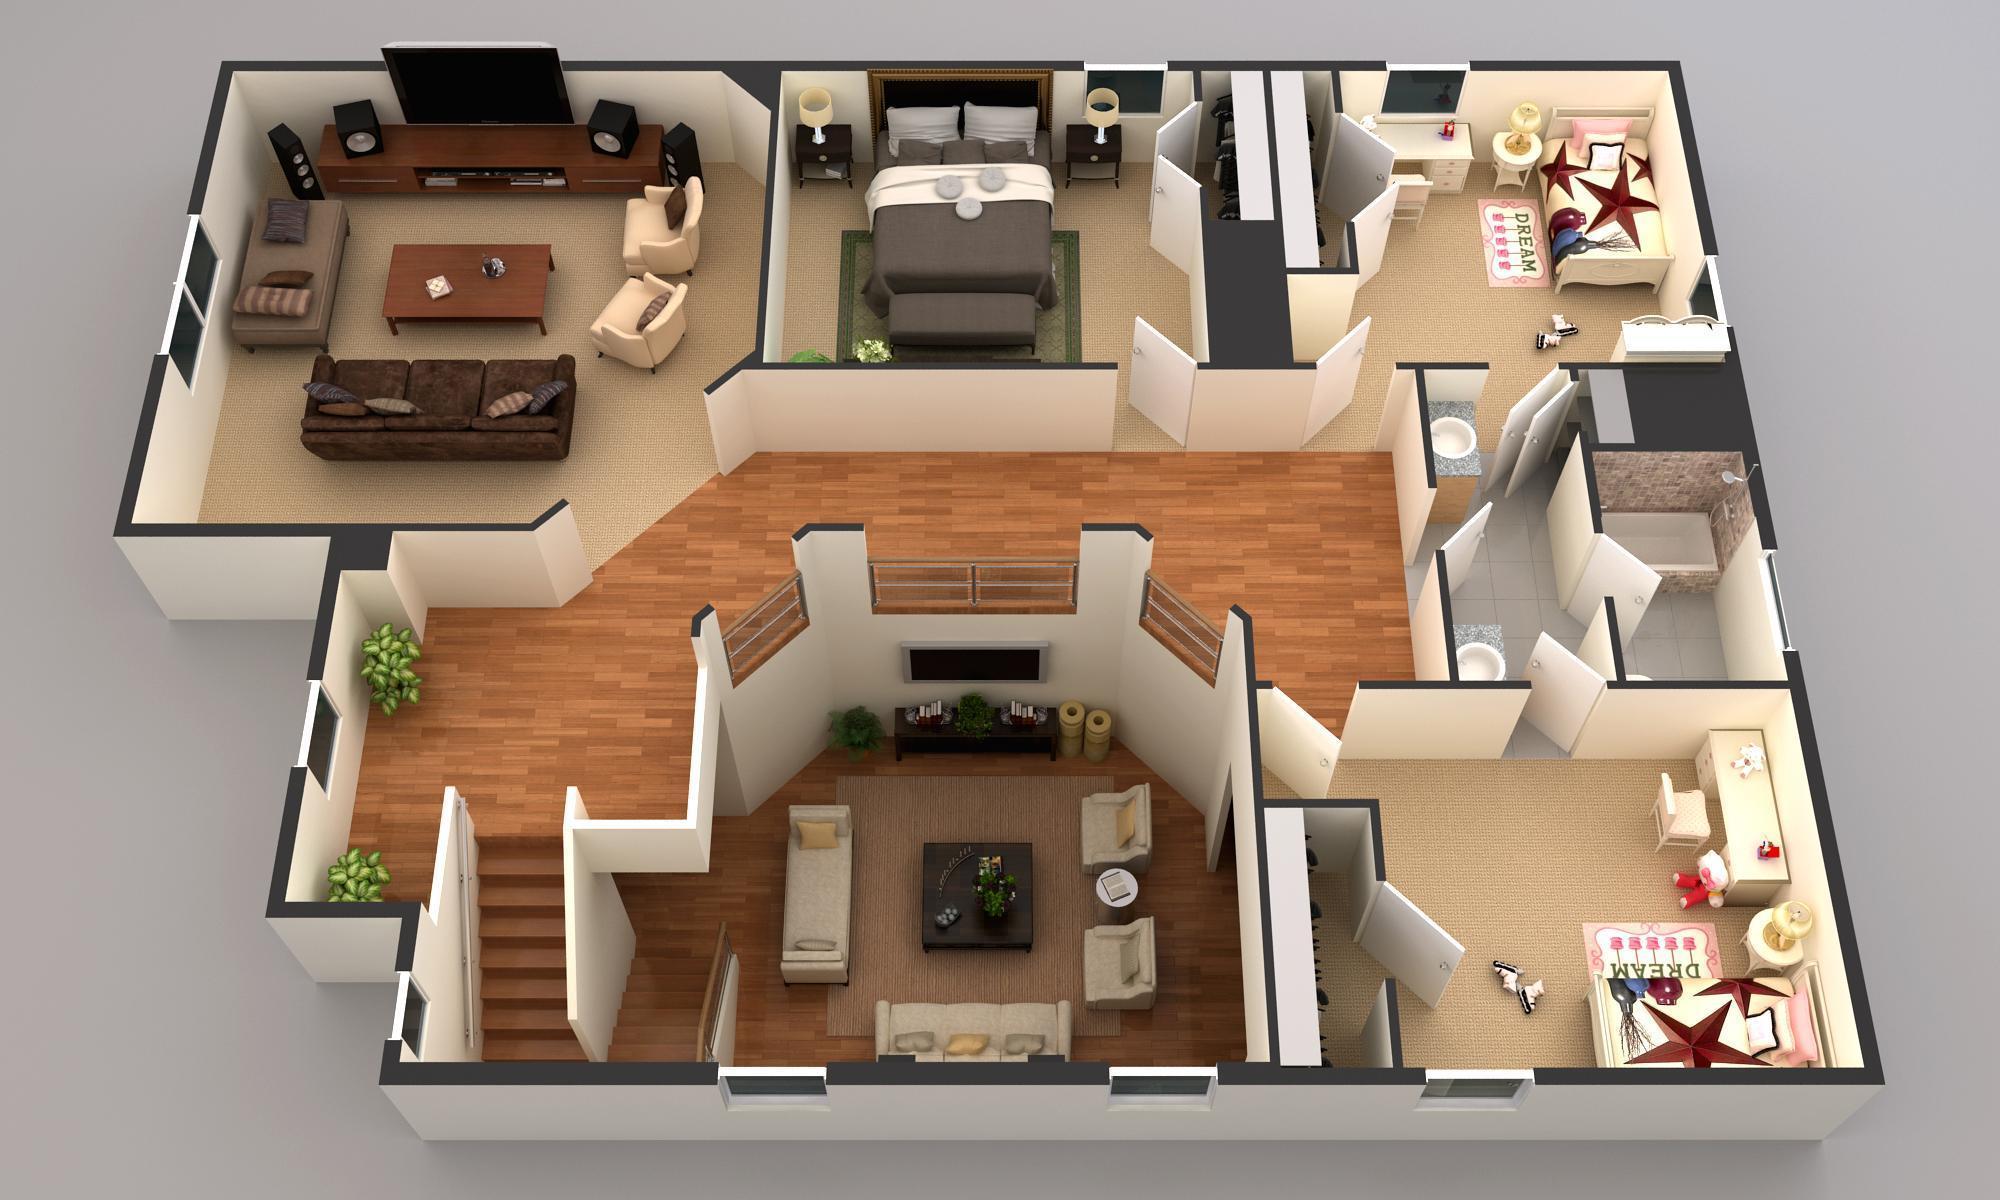 Wellington 2nd level rendering